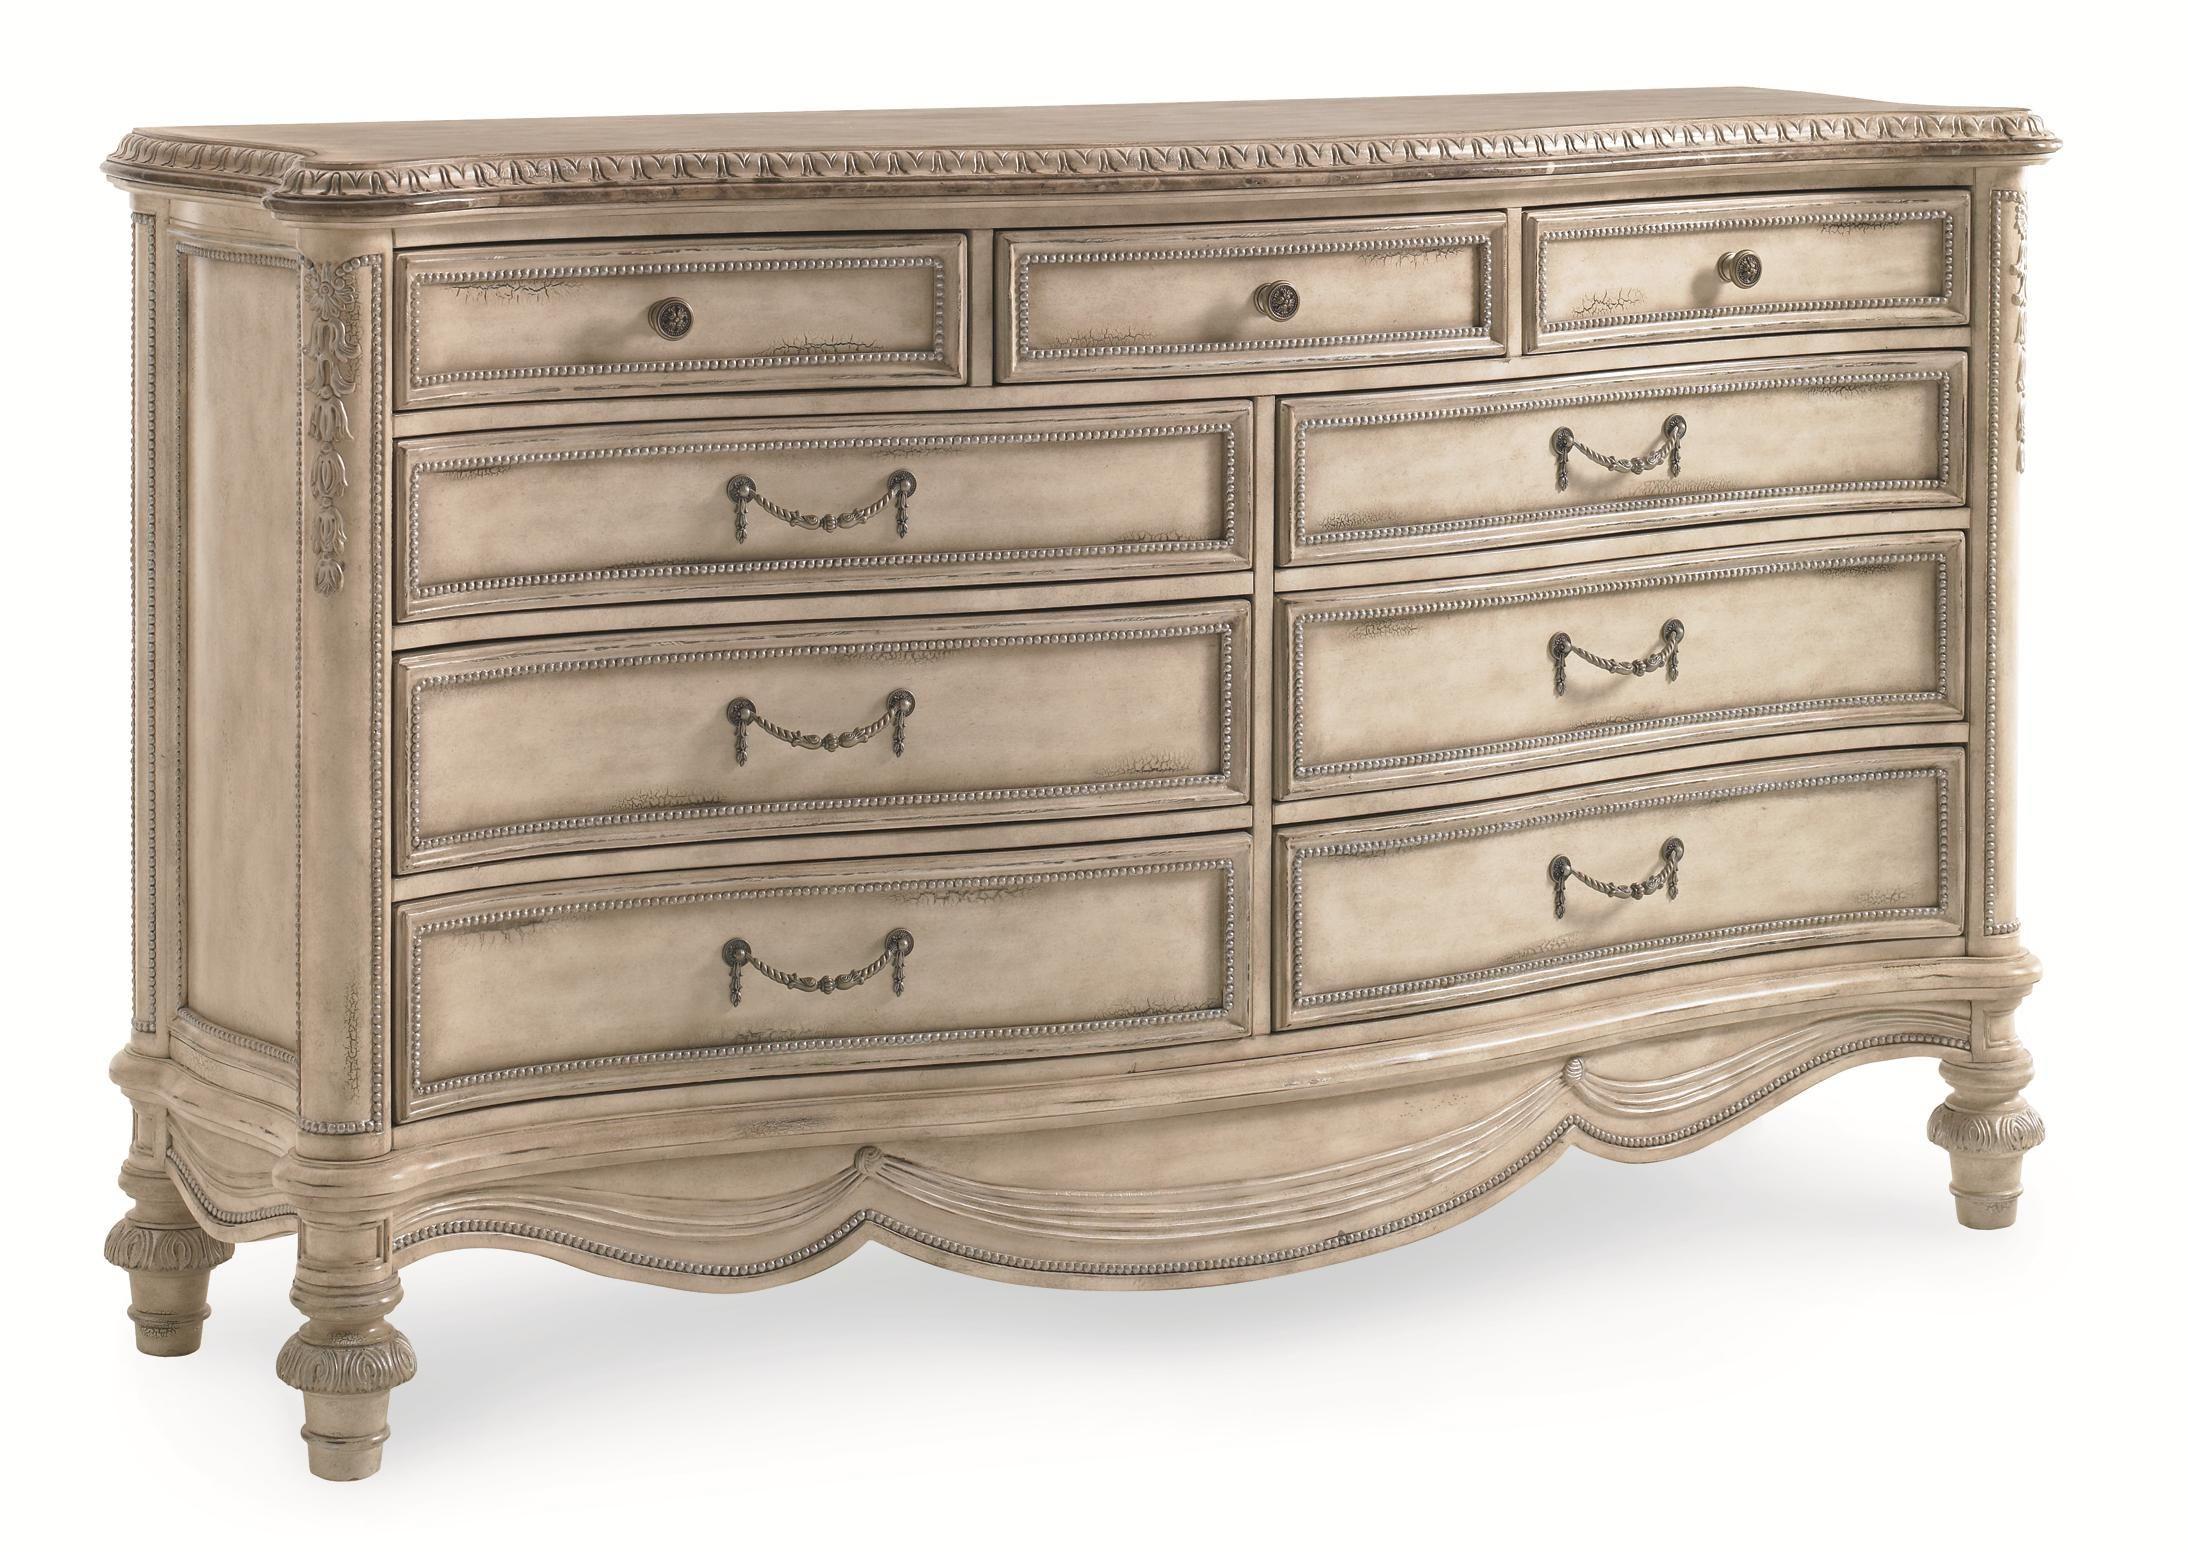 marble top bedroom furniture%0A Empire II Double Dresser by Schnadig